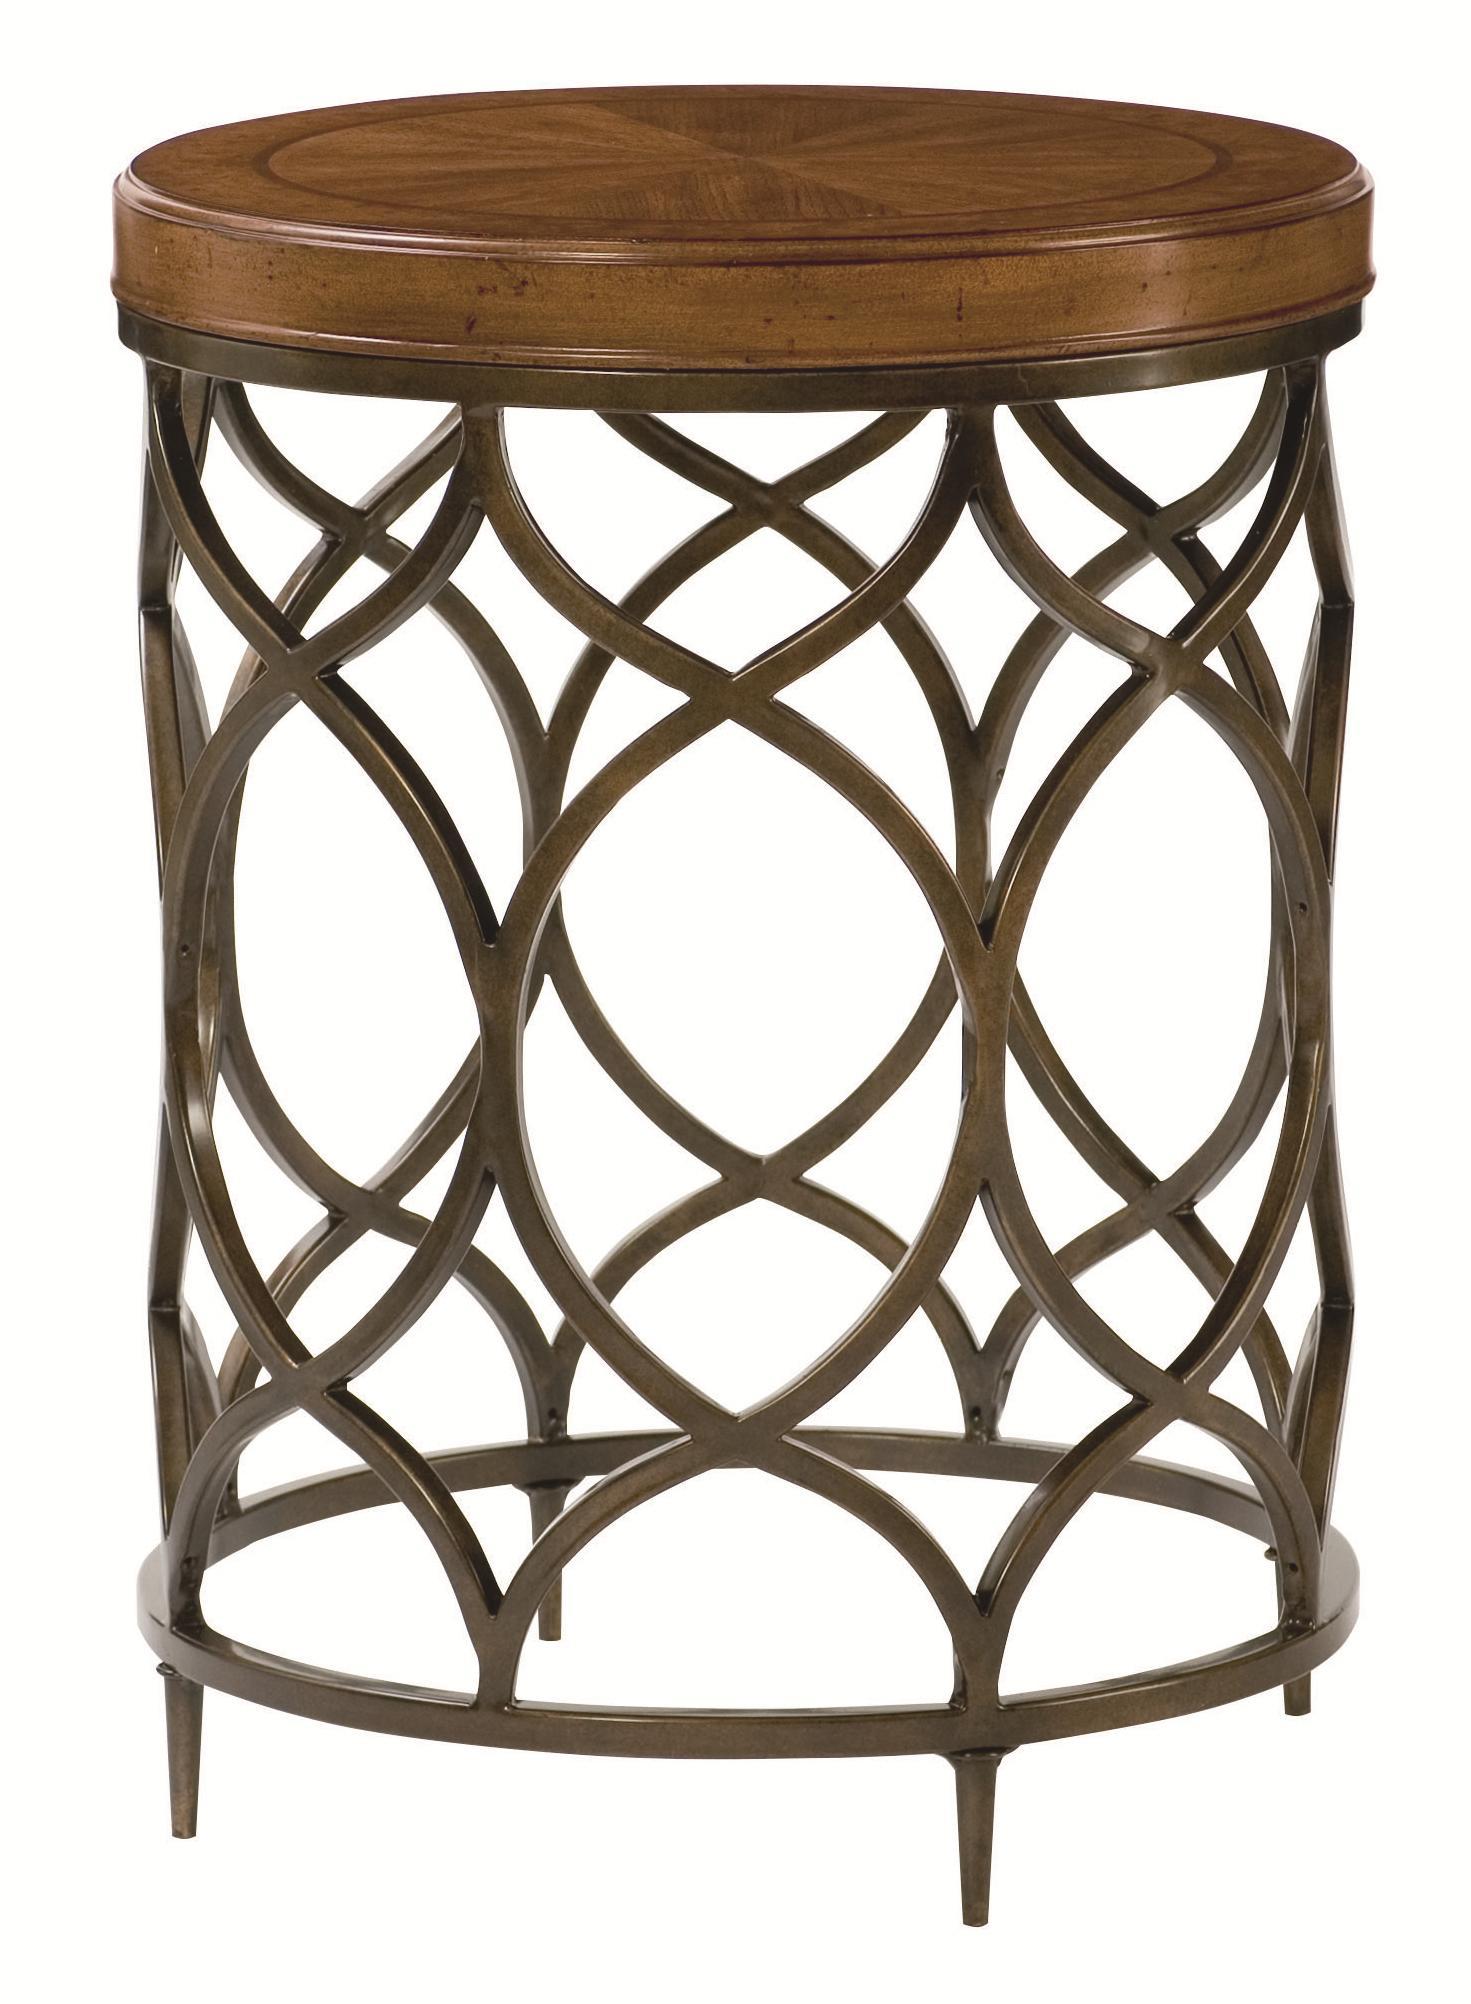 Hidden Treasures Round Lamp Table by Hammary at Johnny Janosik